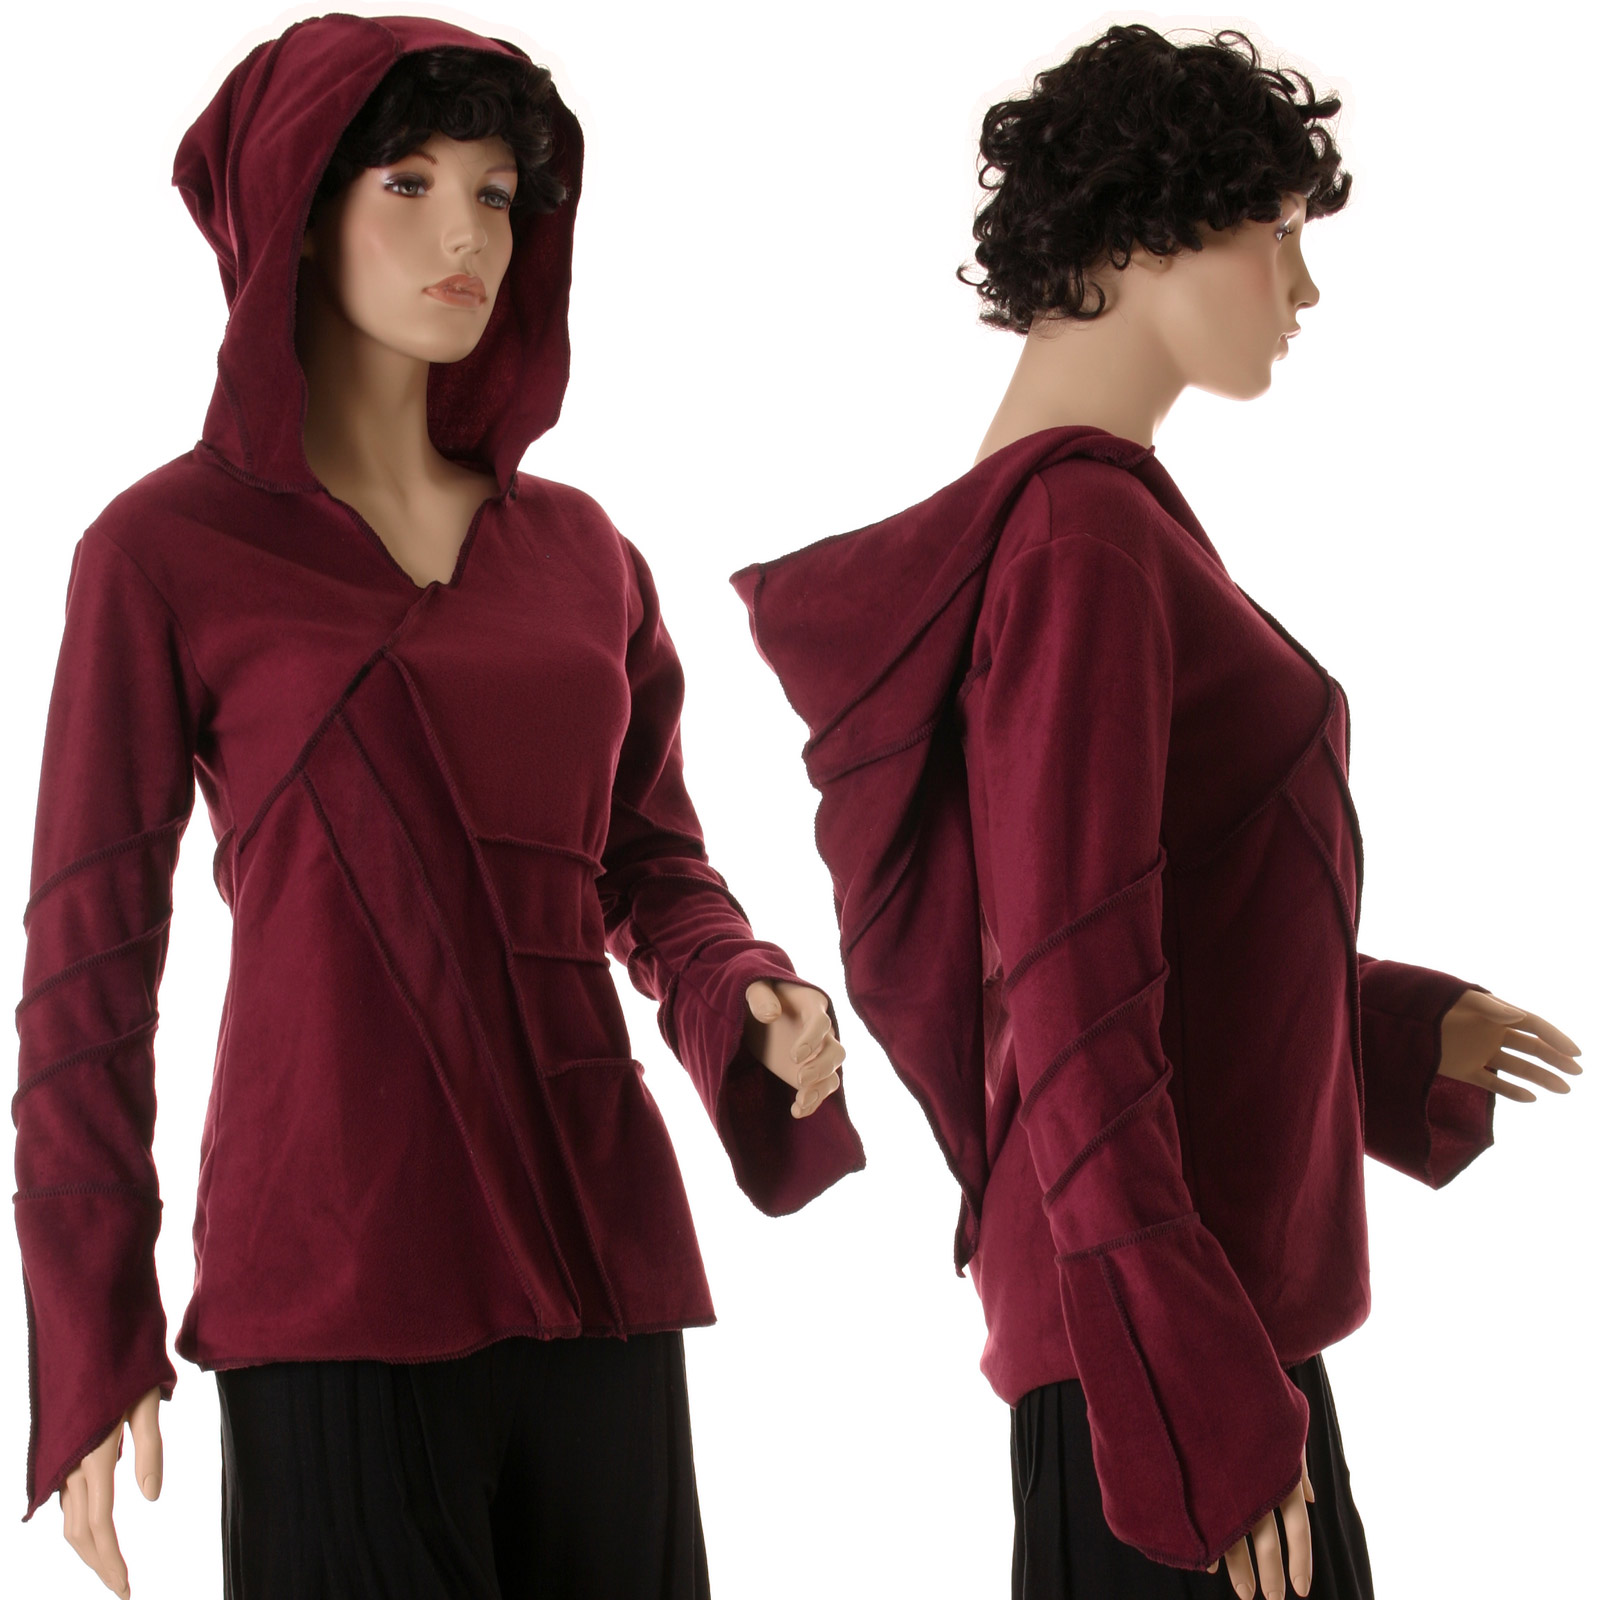 Goa-Damen-Fleece-Pullover-warm-Zipfelkapuze-Nepal-Larp-Elfen-Pullover-36-40-42